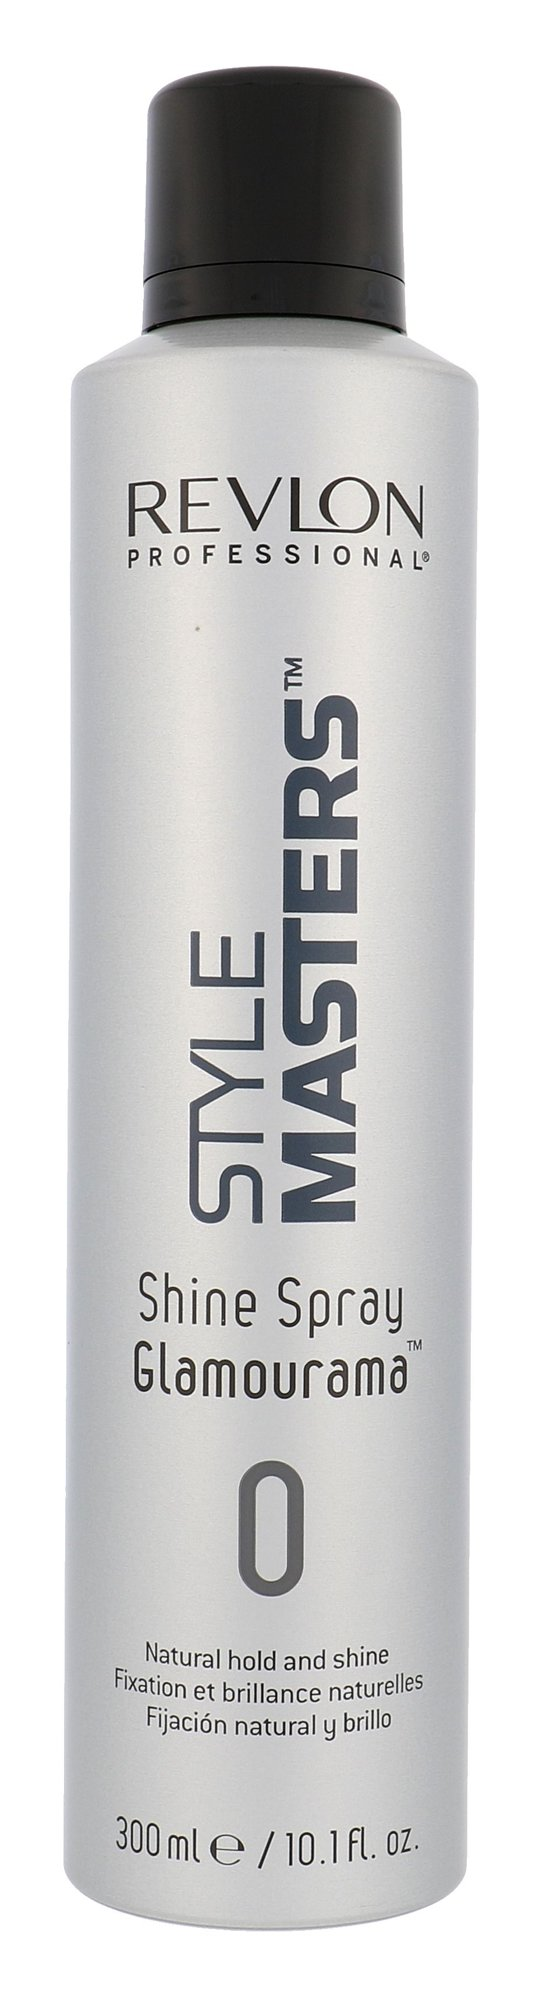 Revlon Professional Style Masters For Hair Shine 300ml  Shine Spray Glamourama